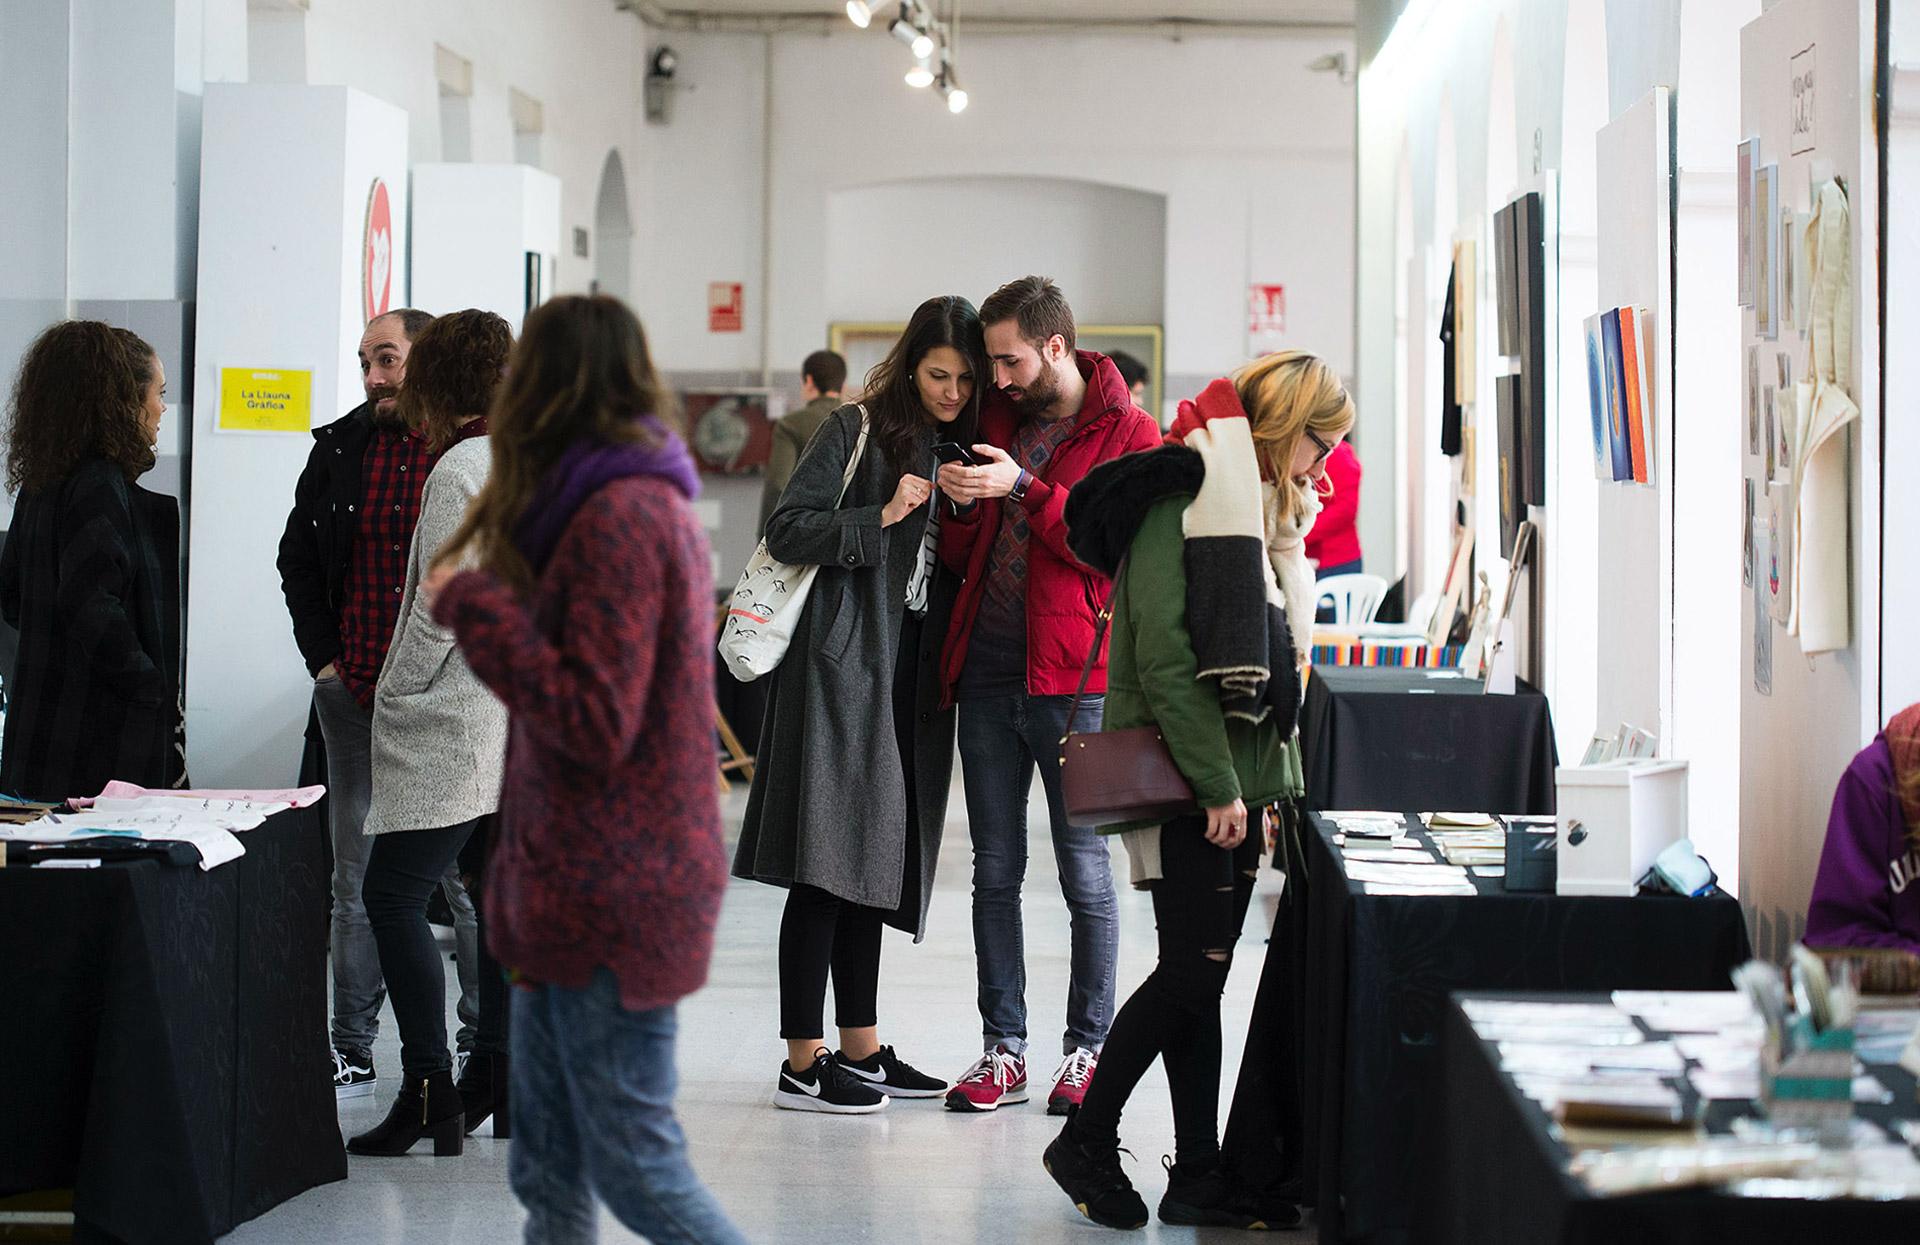 Festival Emac - Fotografa Carmen Ripollès (ACF Fotografía)